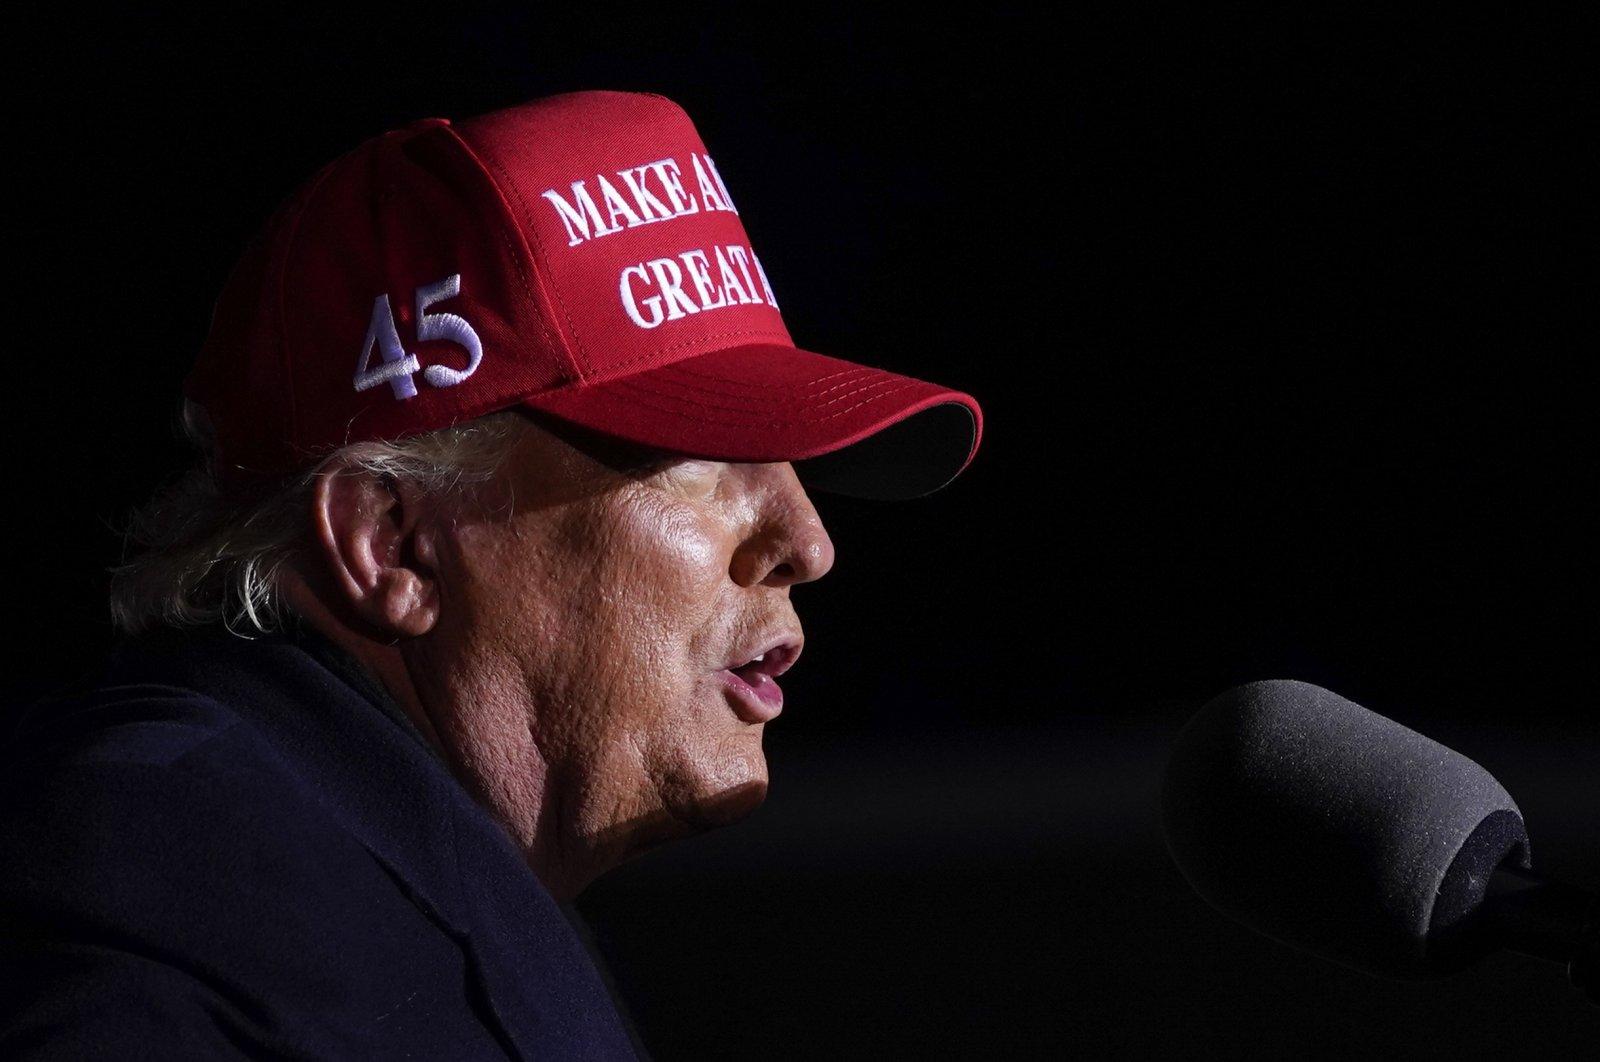 U.S. President Donald Trump speaks during a campaign rally at Kenosha Regional Airport, Monday, Nov. 2, 2020, in Kenosha, Wis. (AP Photo)